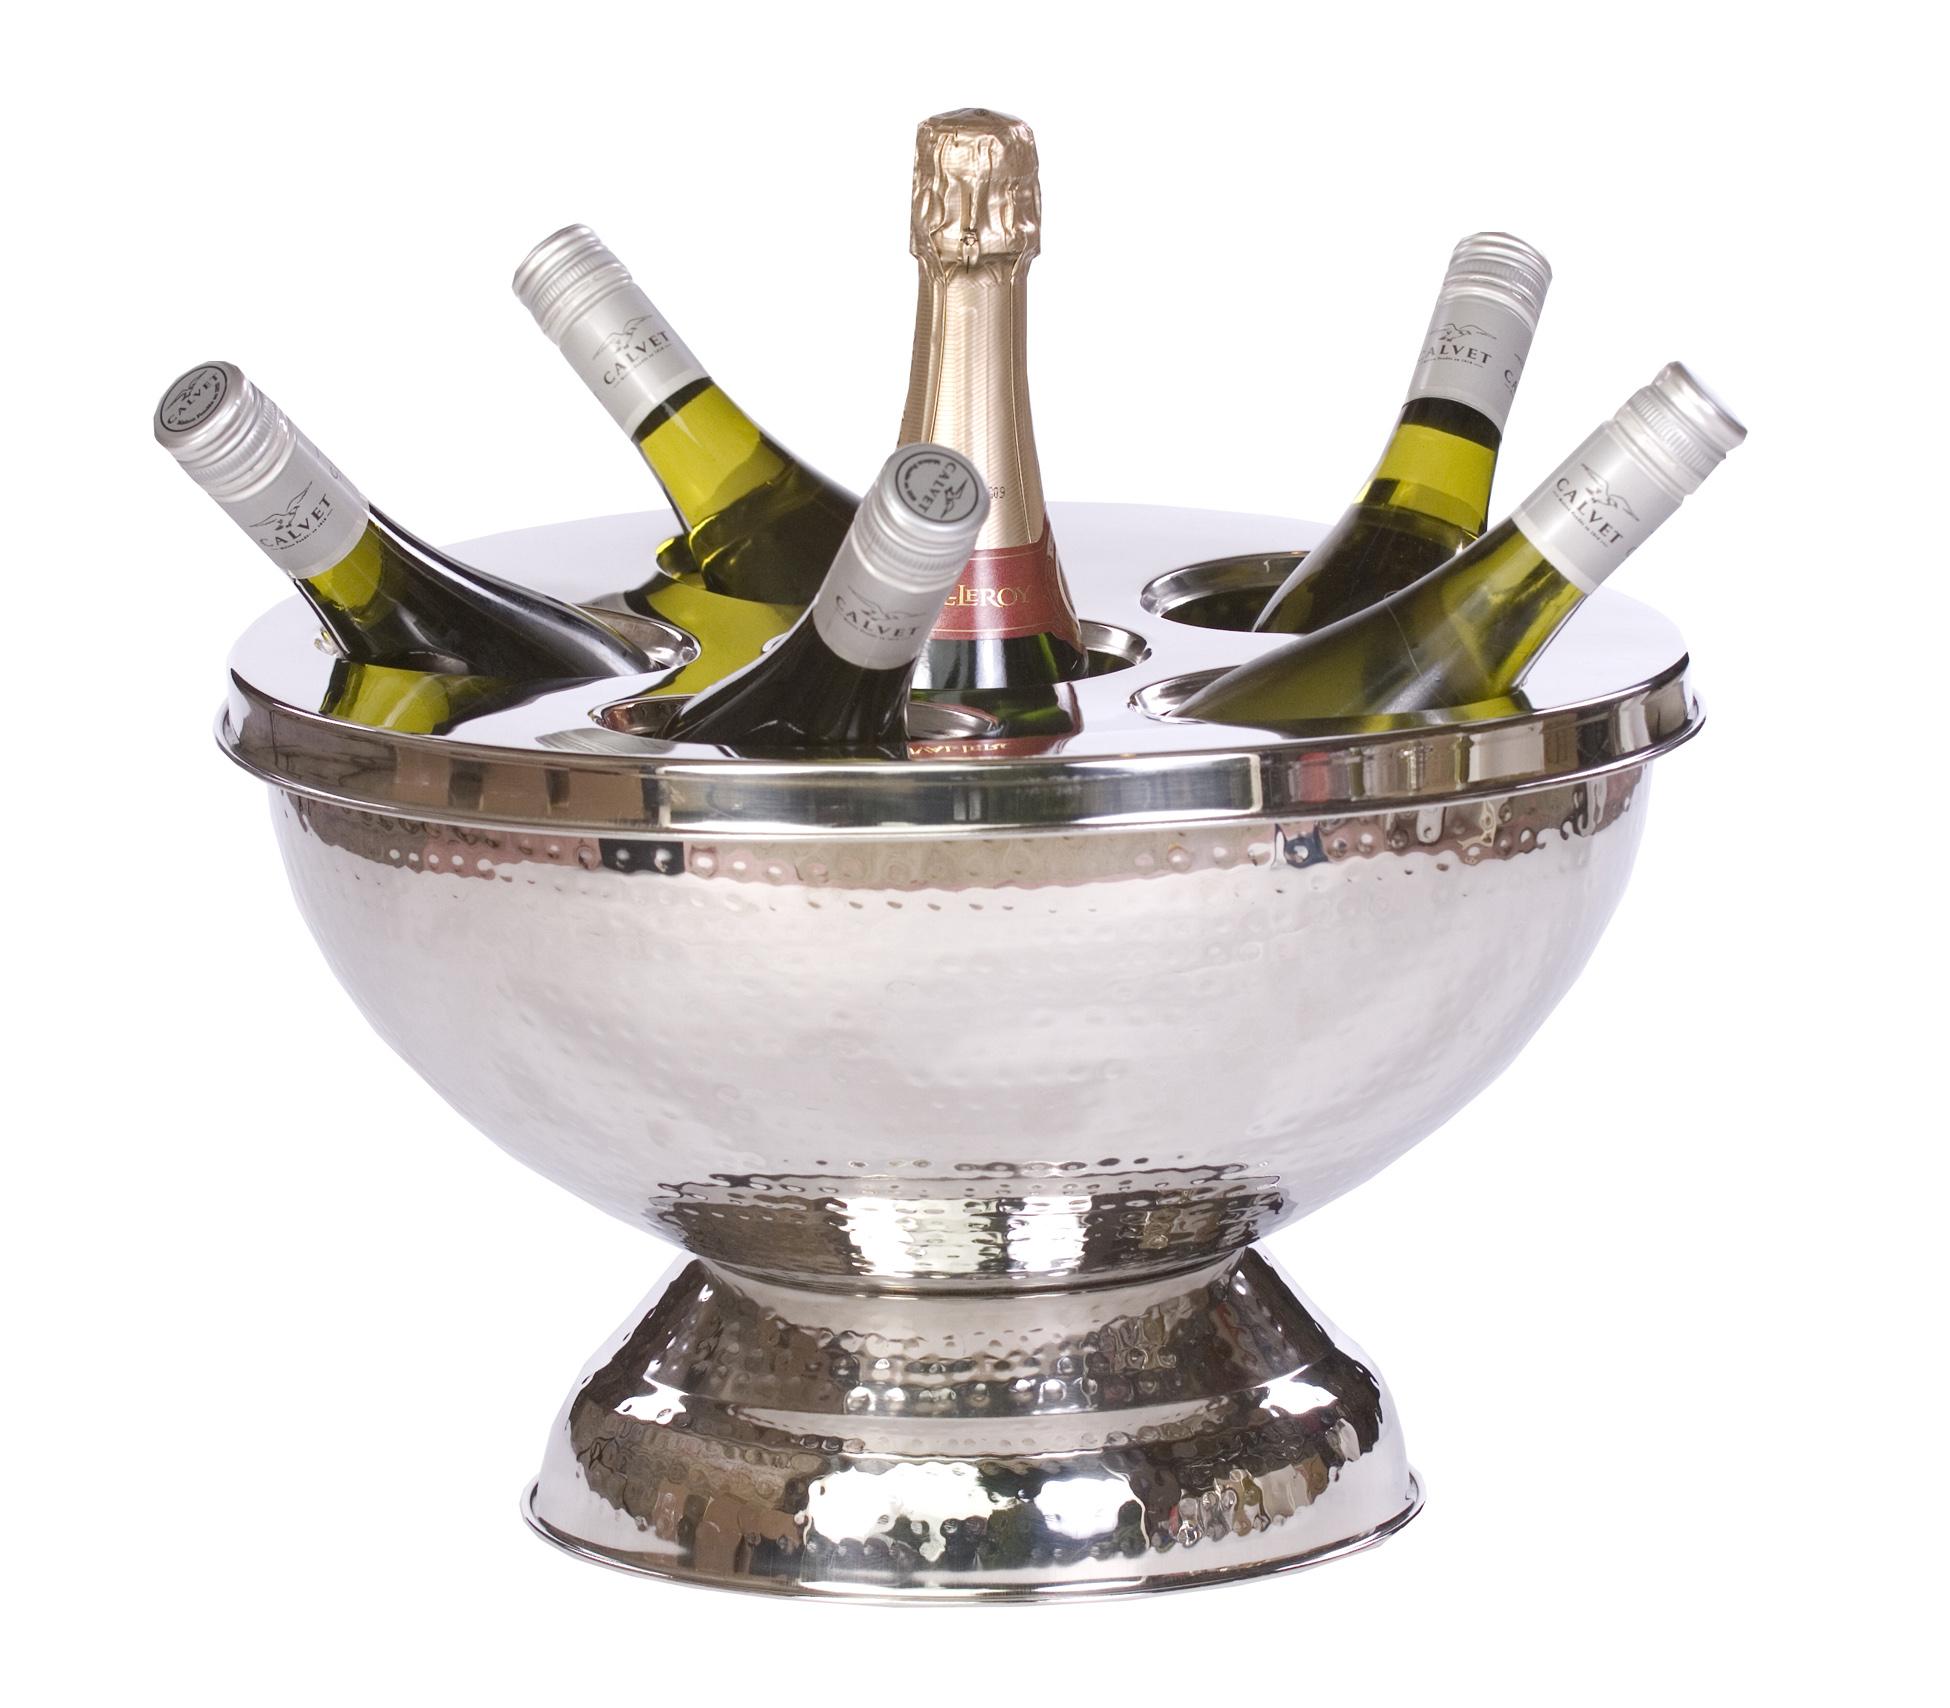 eddingtons  bottle champagne wine cooler bucket beer ice bar  - epicurean regal  bottle wine  champagne bucket